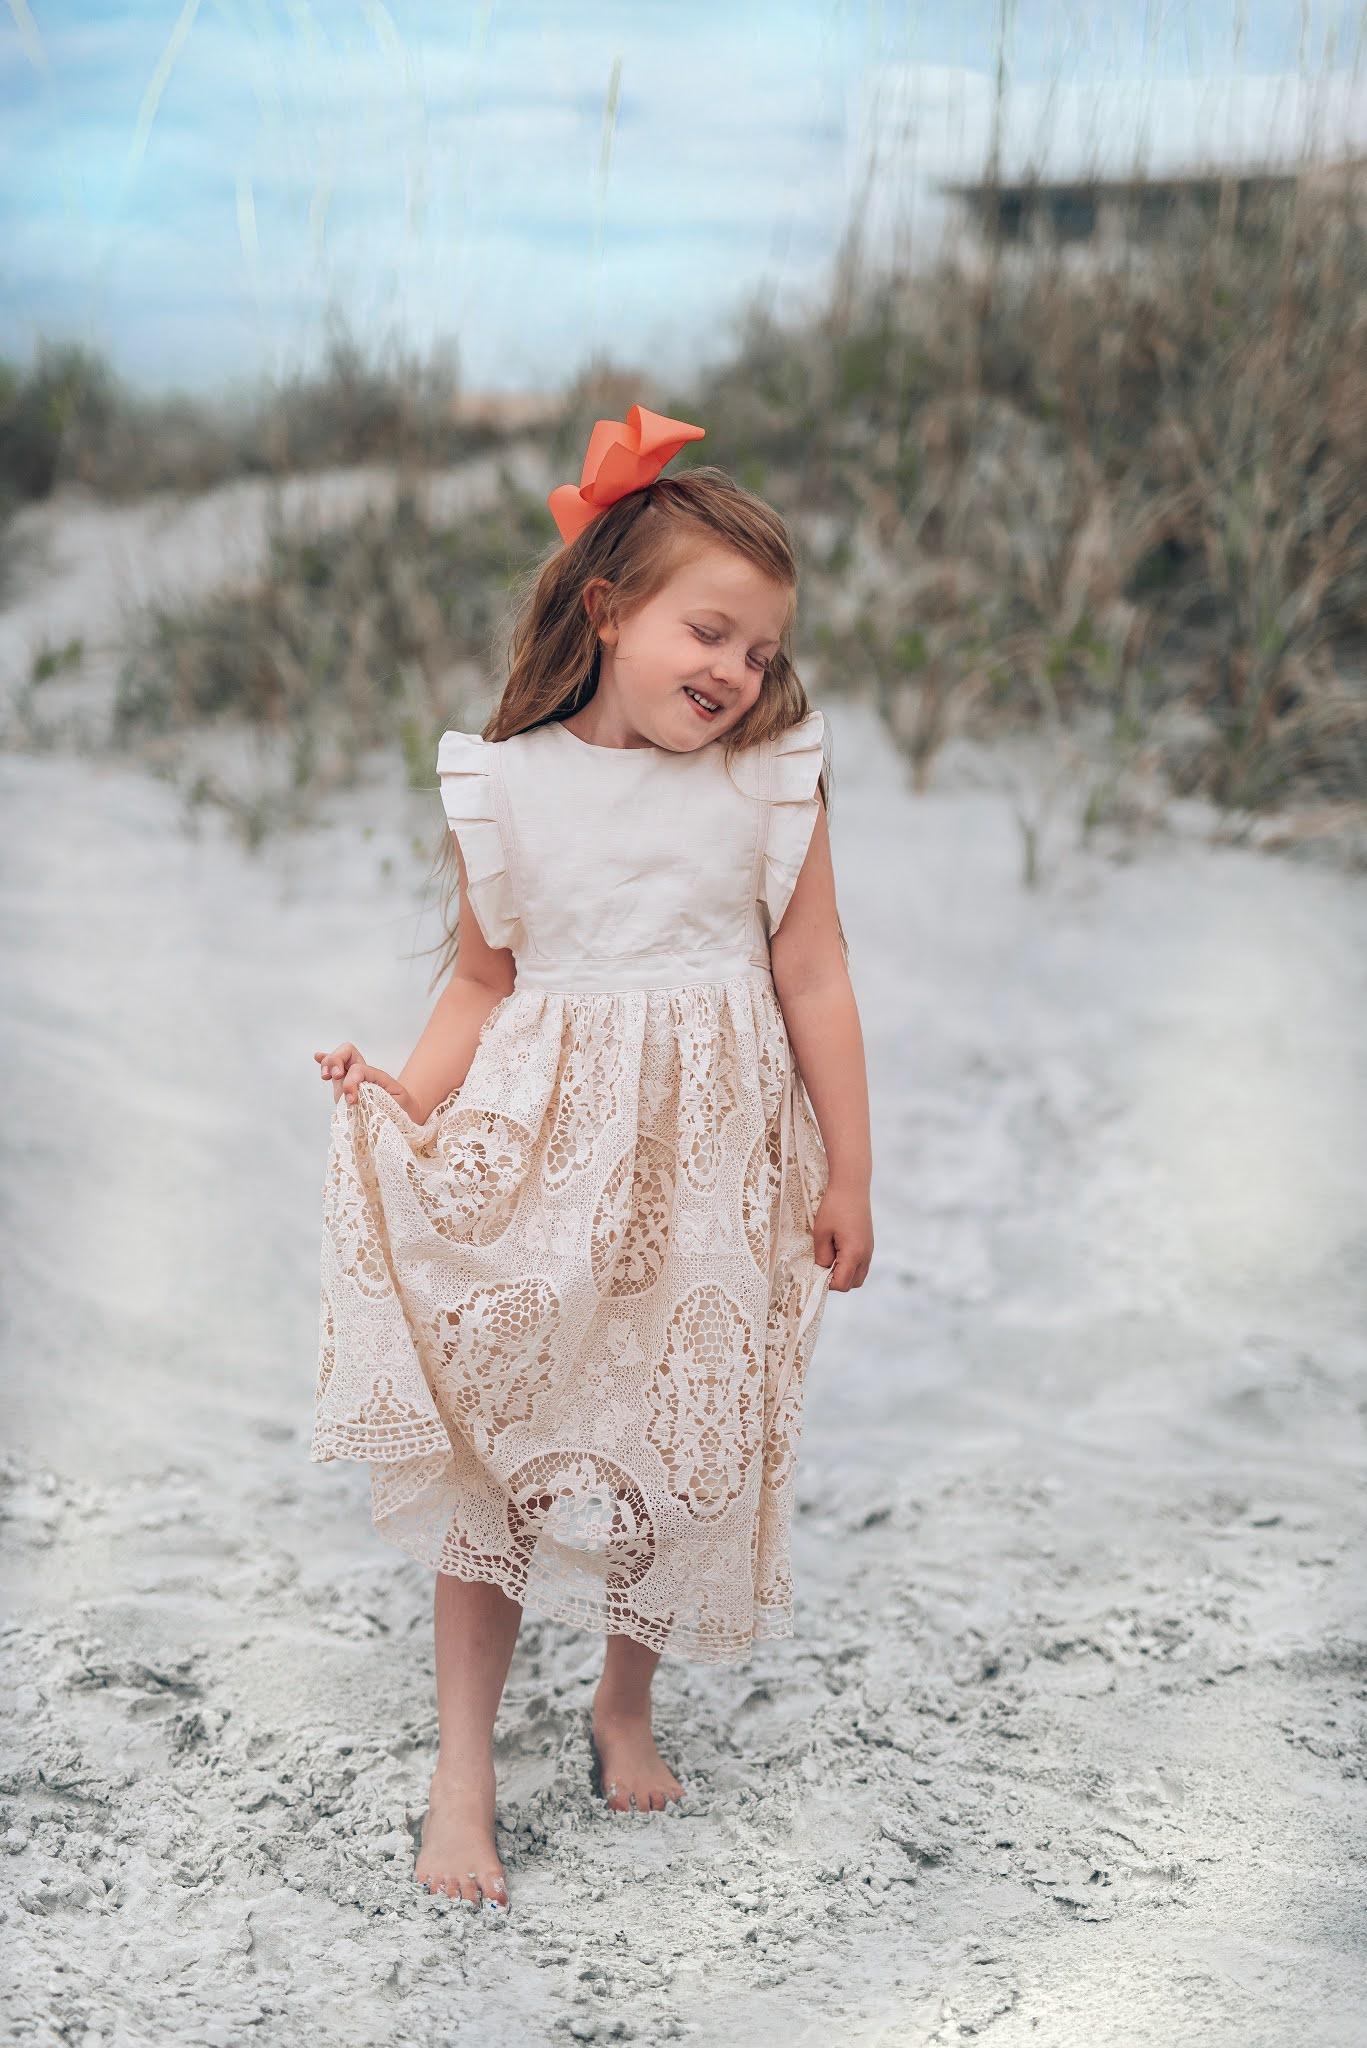 Beach Photos 2021 - Something Delightful Blog #beachphotos #motherdaughter #lifeofasinglemom #newsmyrnabeach